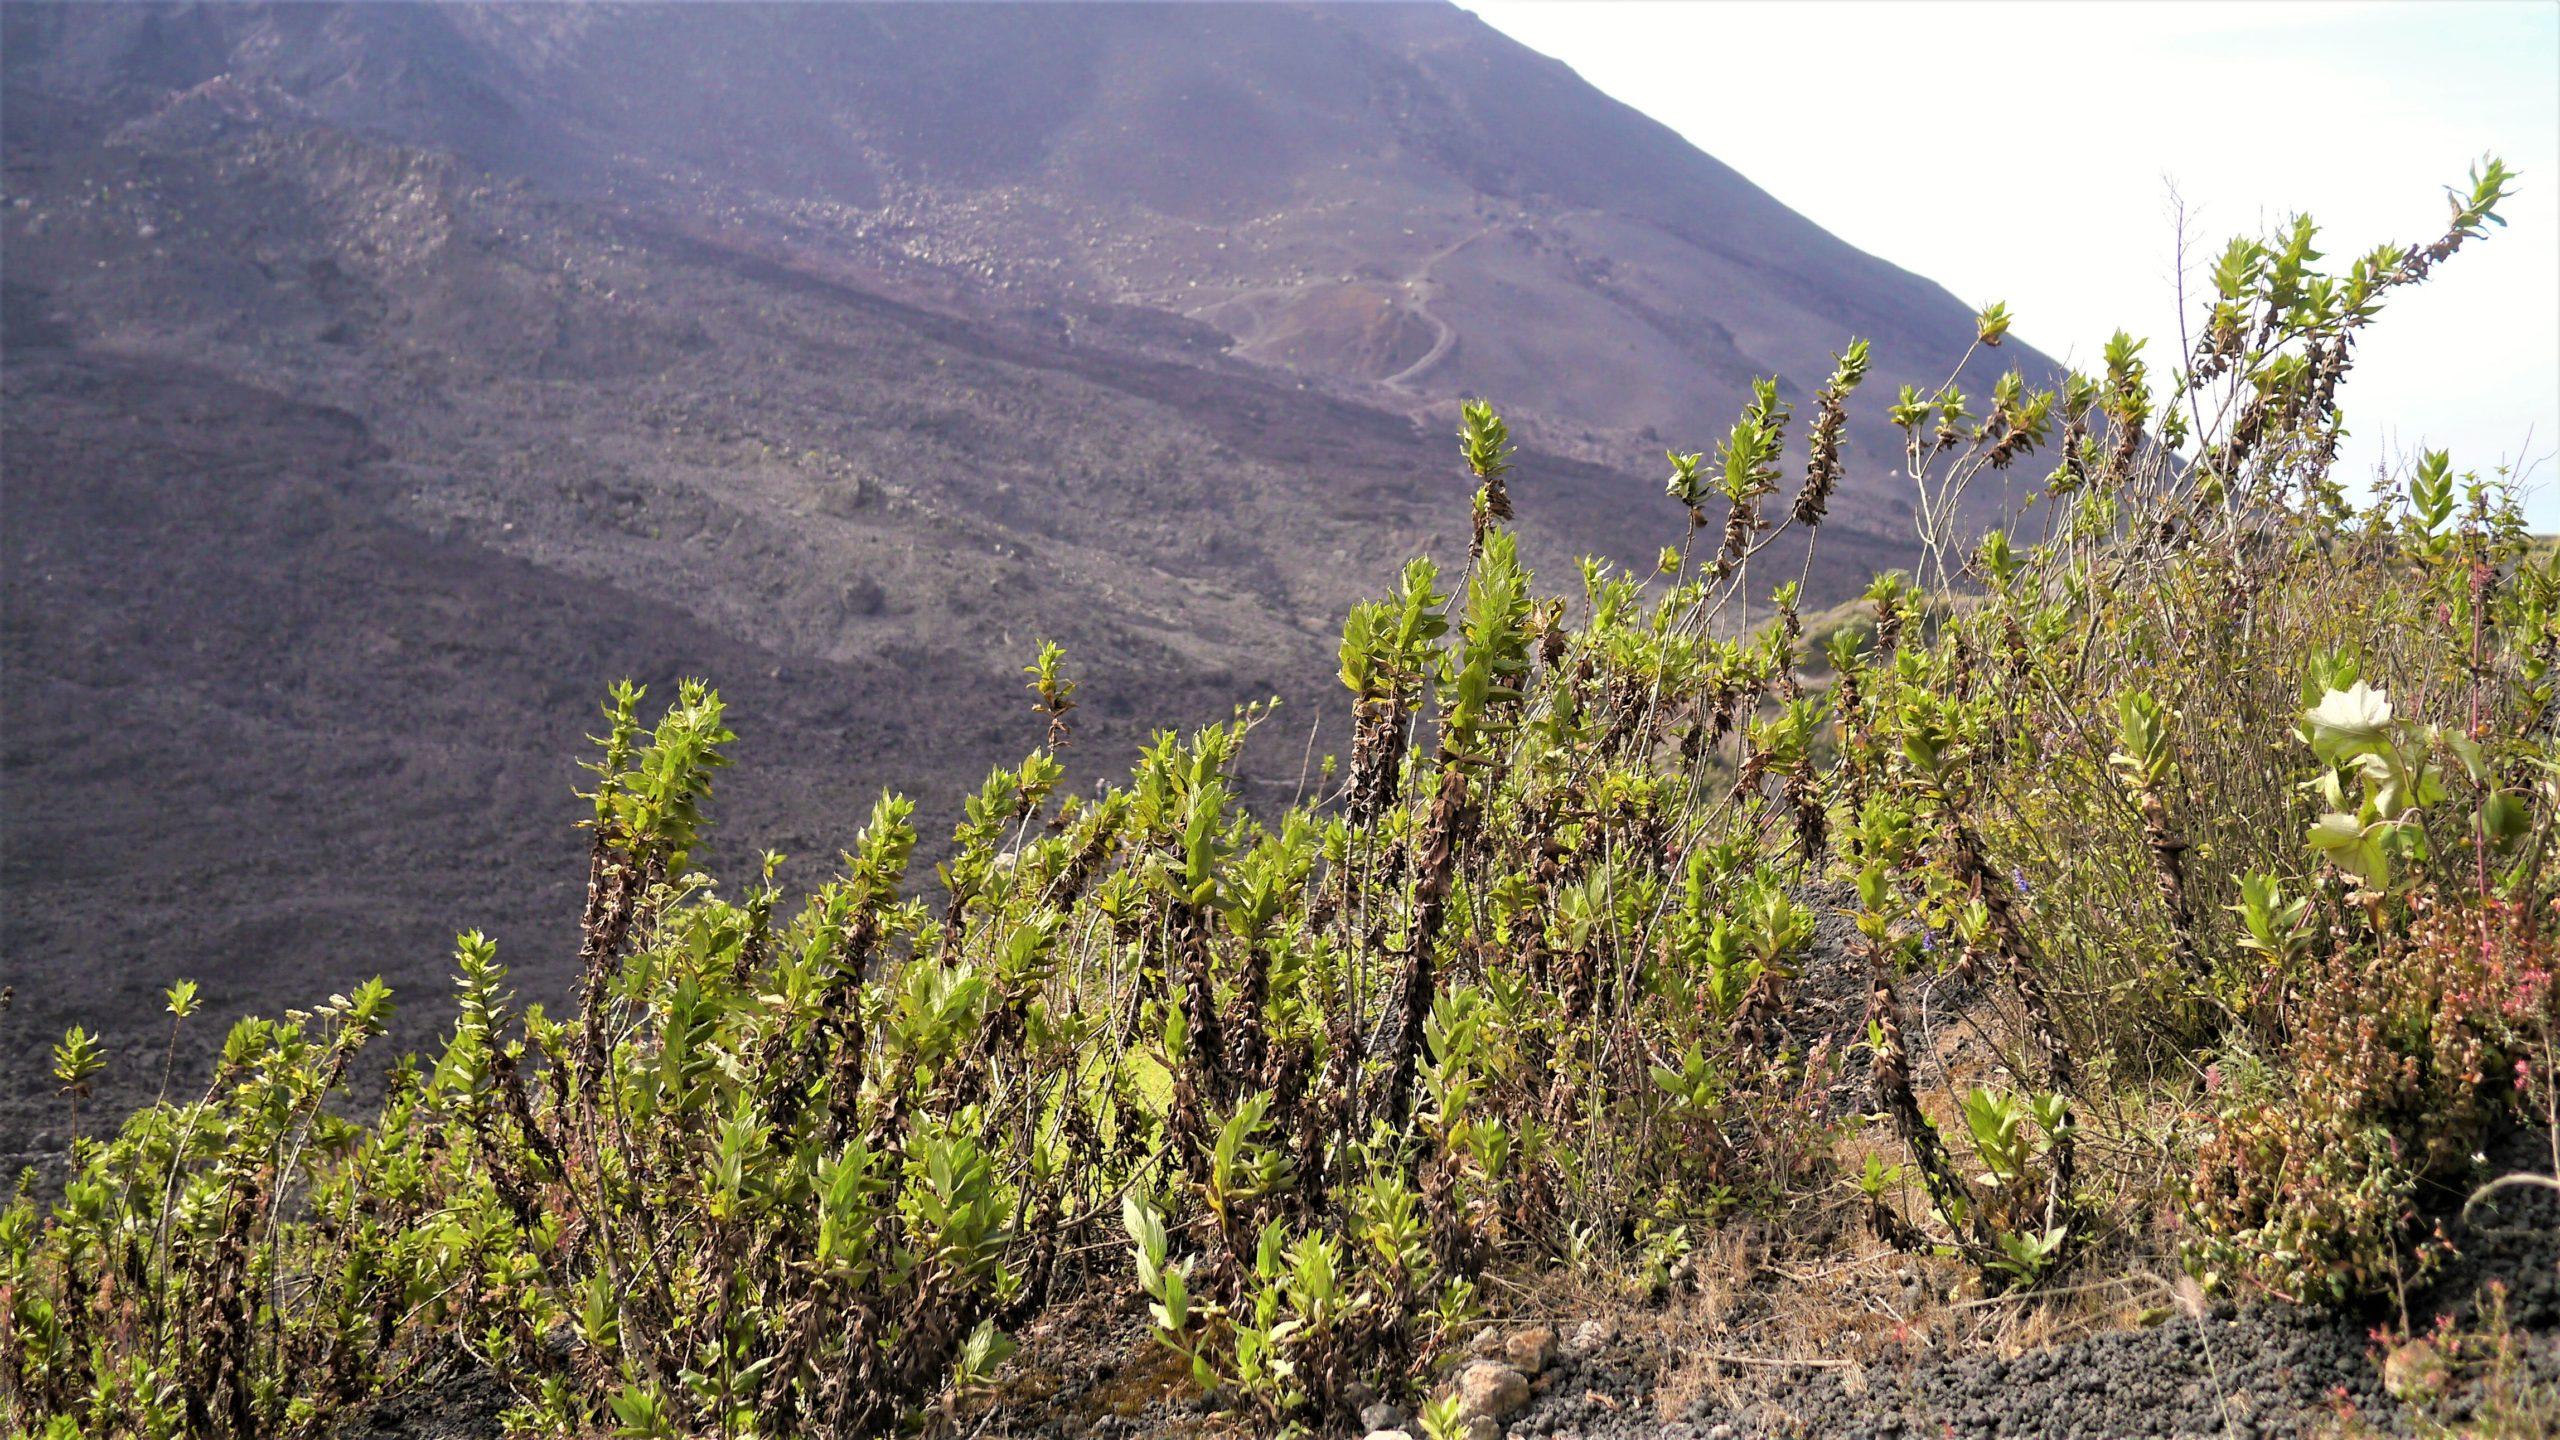 Guatemala volcan Pacaya infos pratiques blog voyage arpenter le chemin